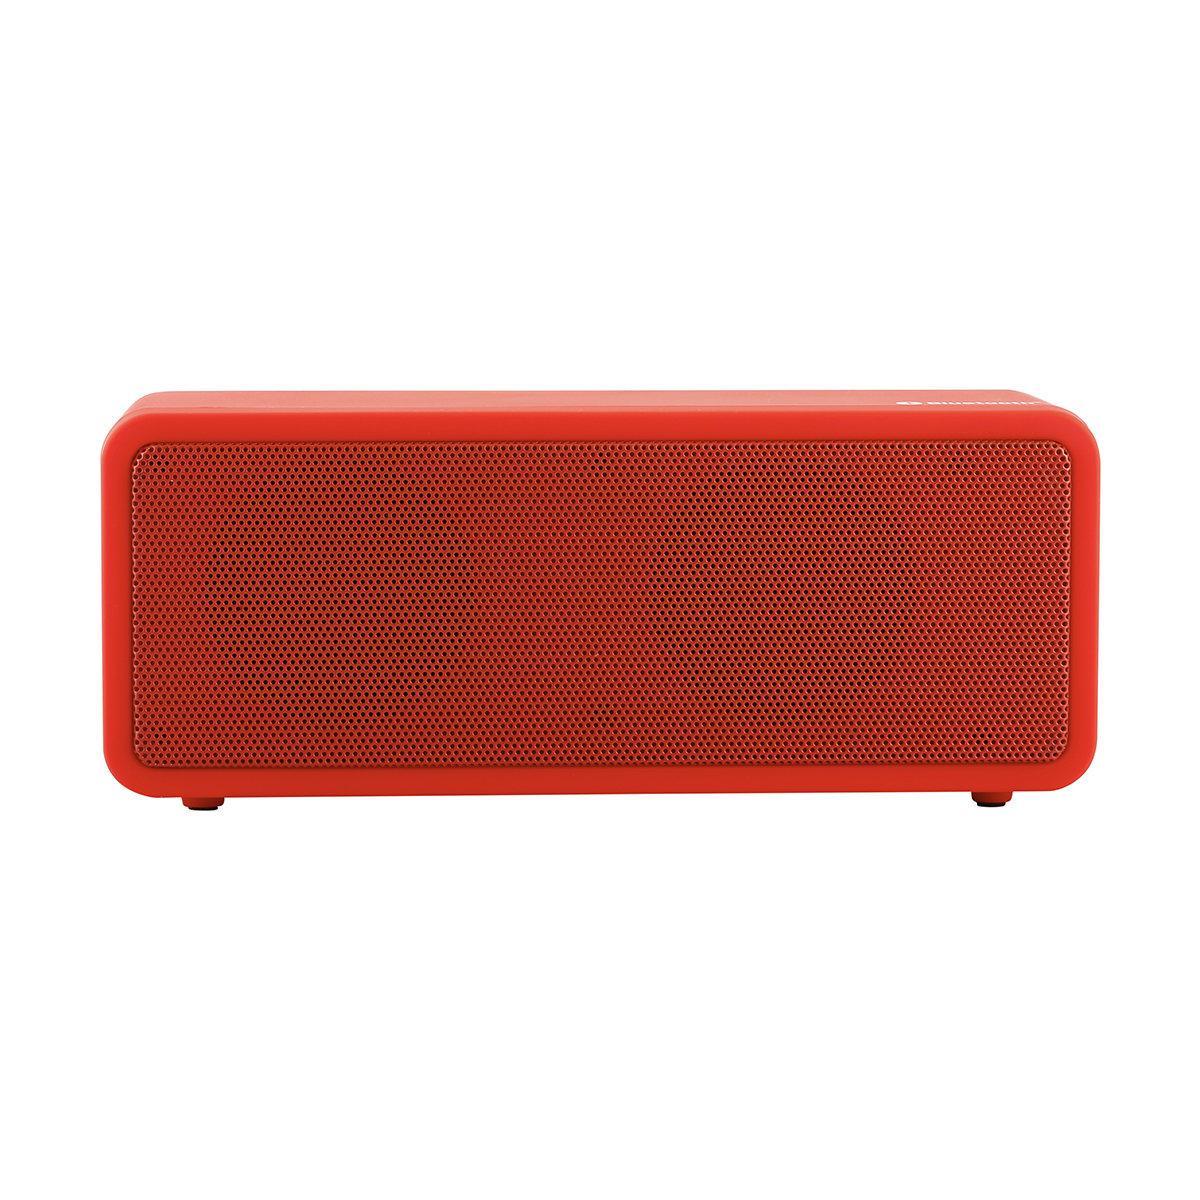 Bluetooth Portable Speaker - Red   Kmart